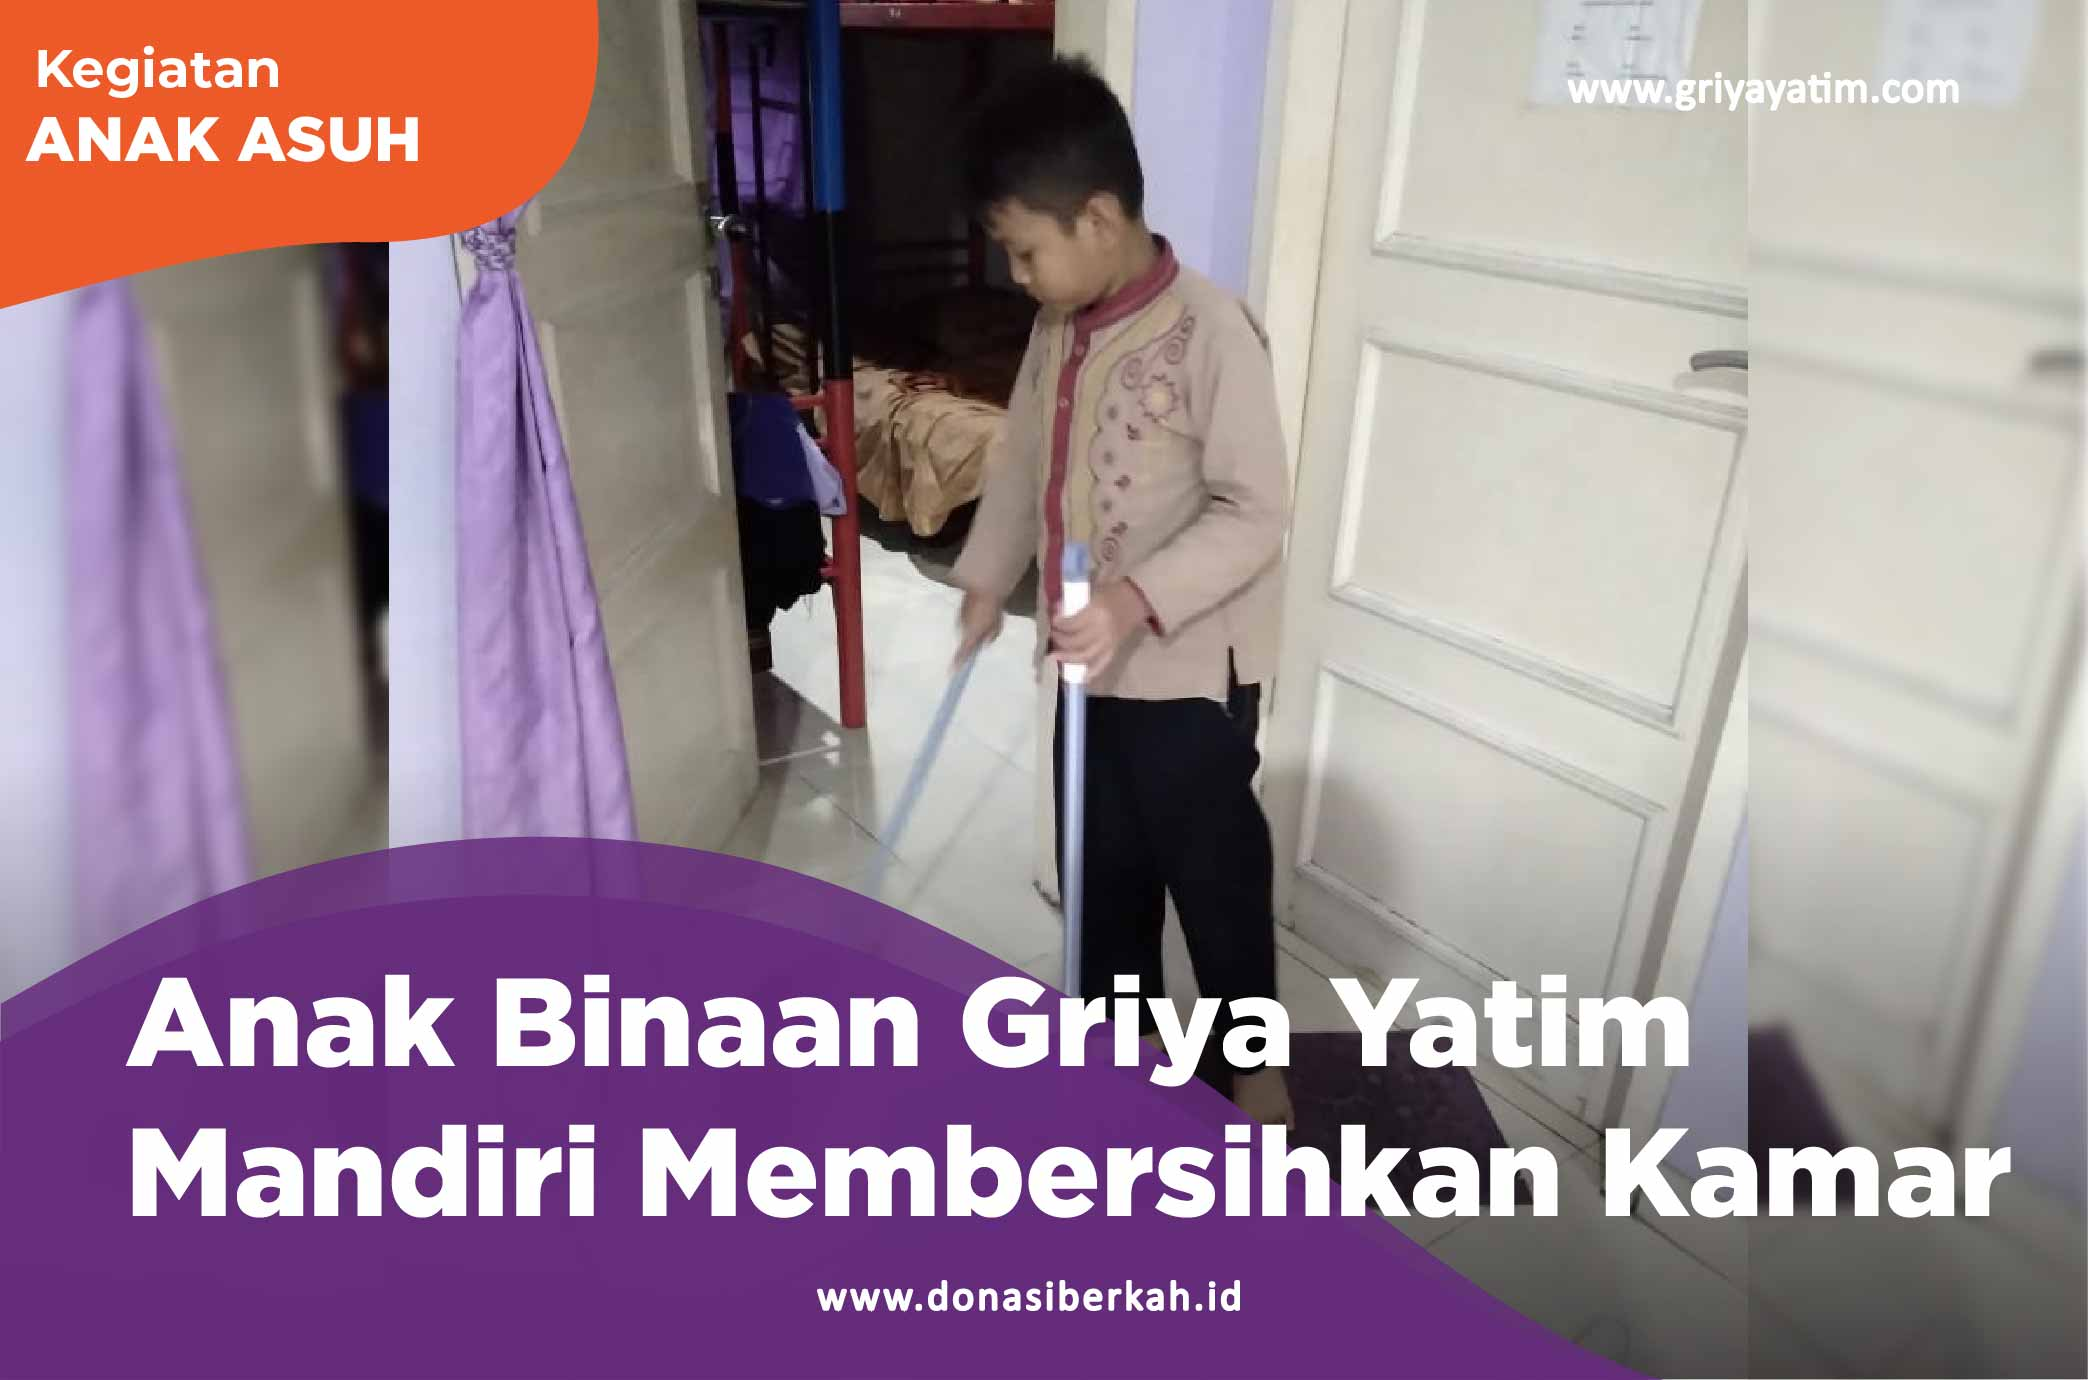 Anak Binaan Griya yatim Mandiri Membersihkan Kamar